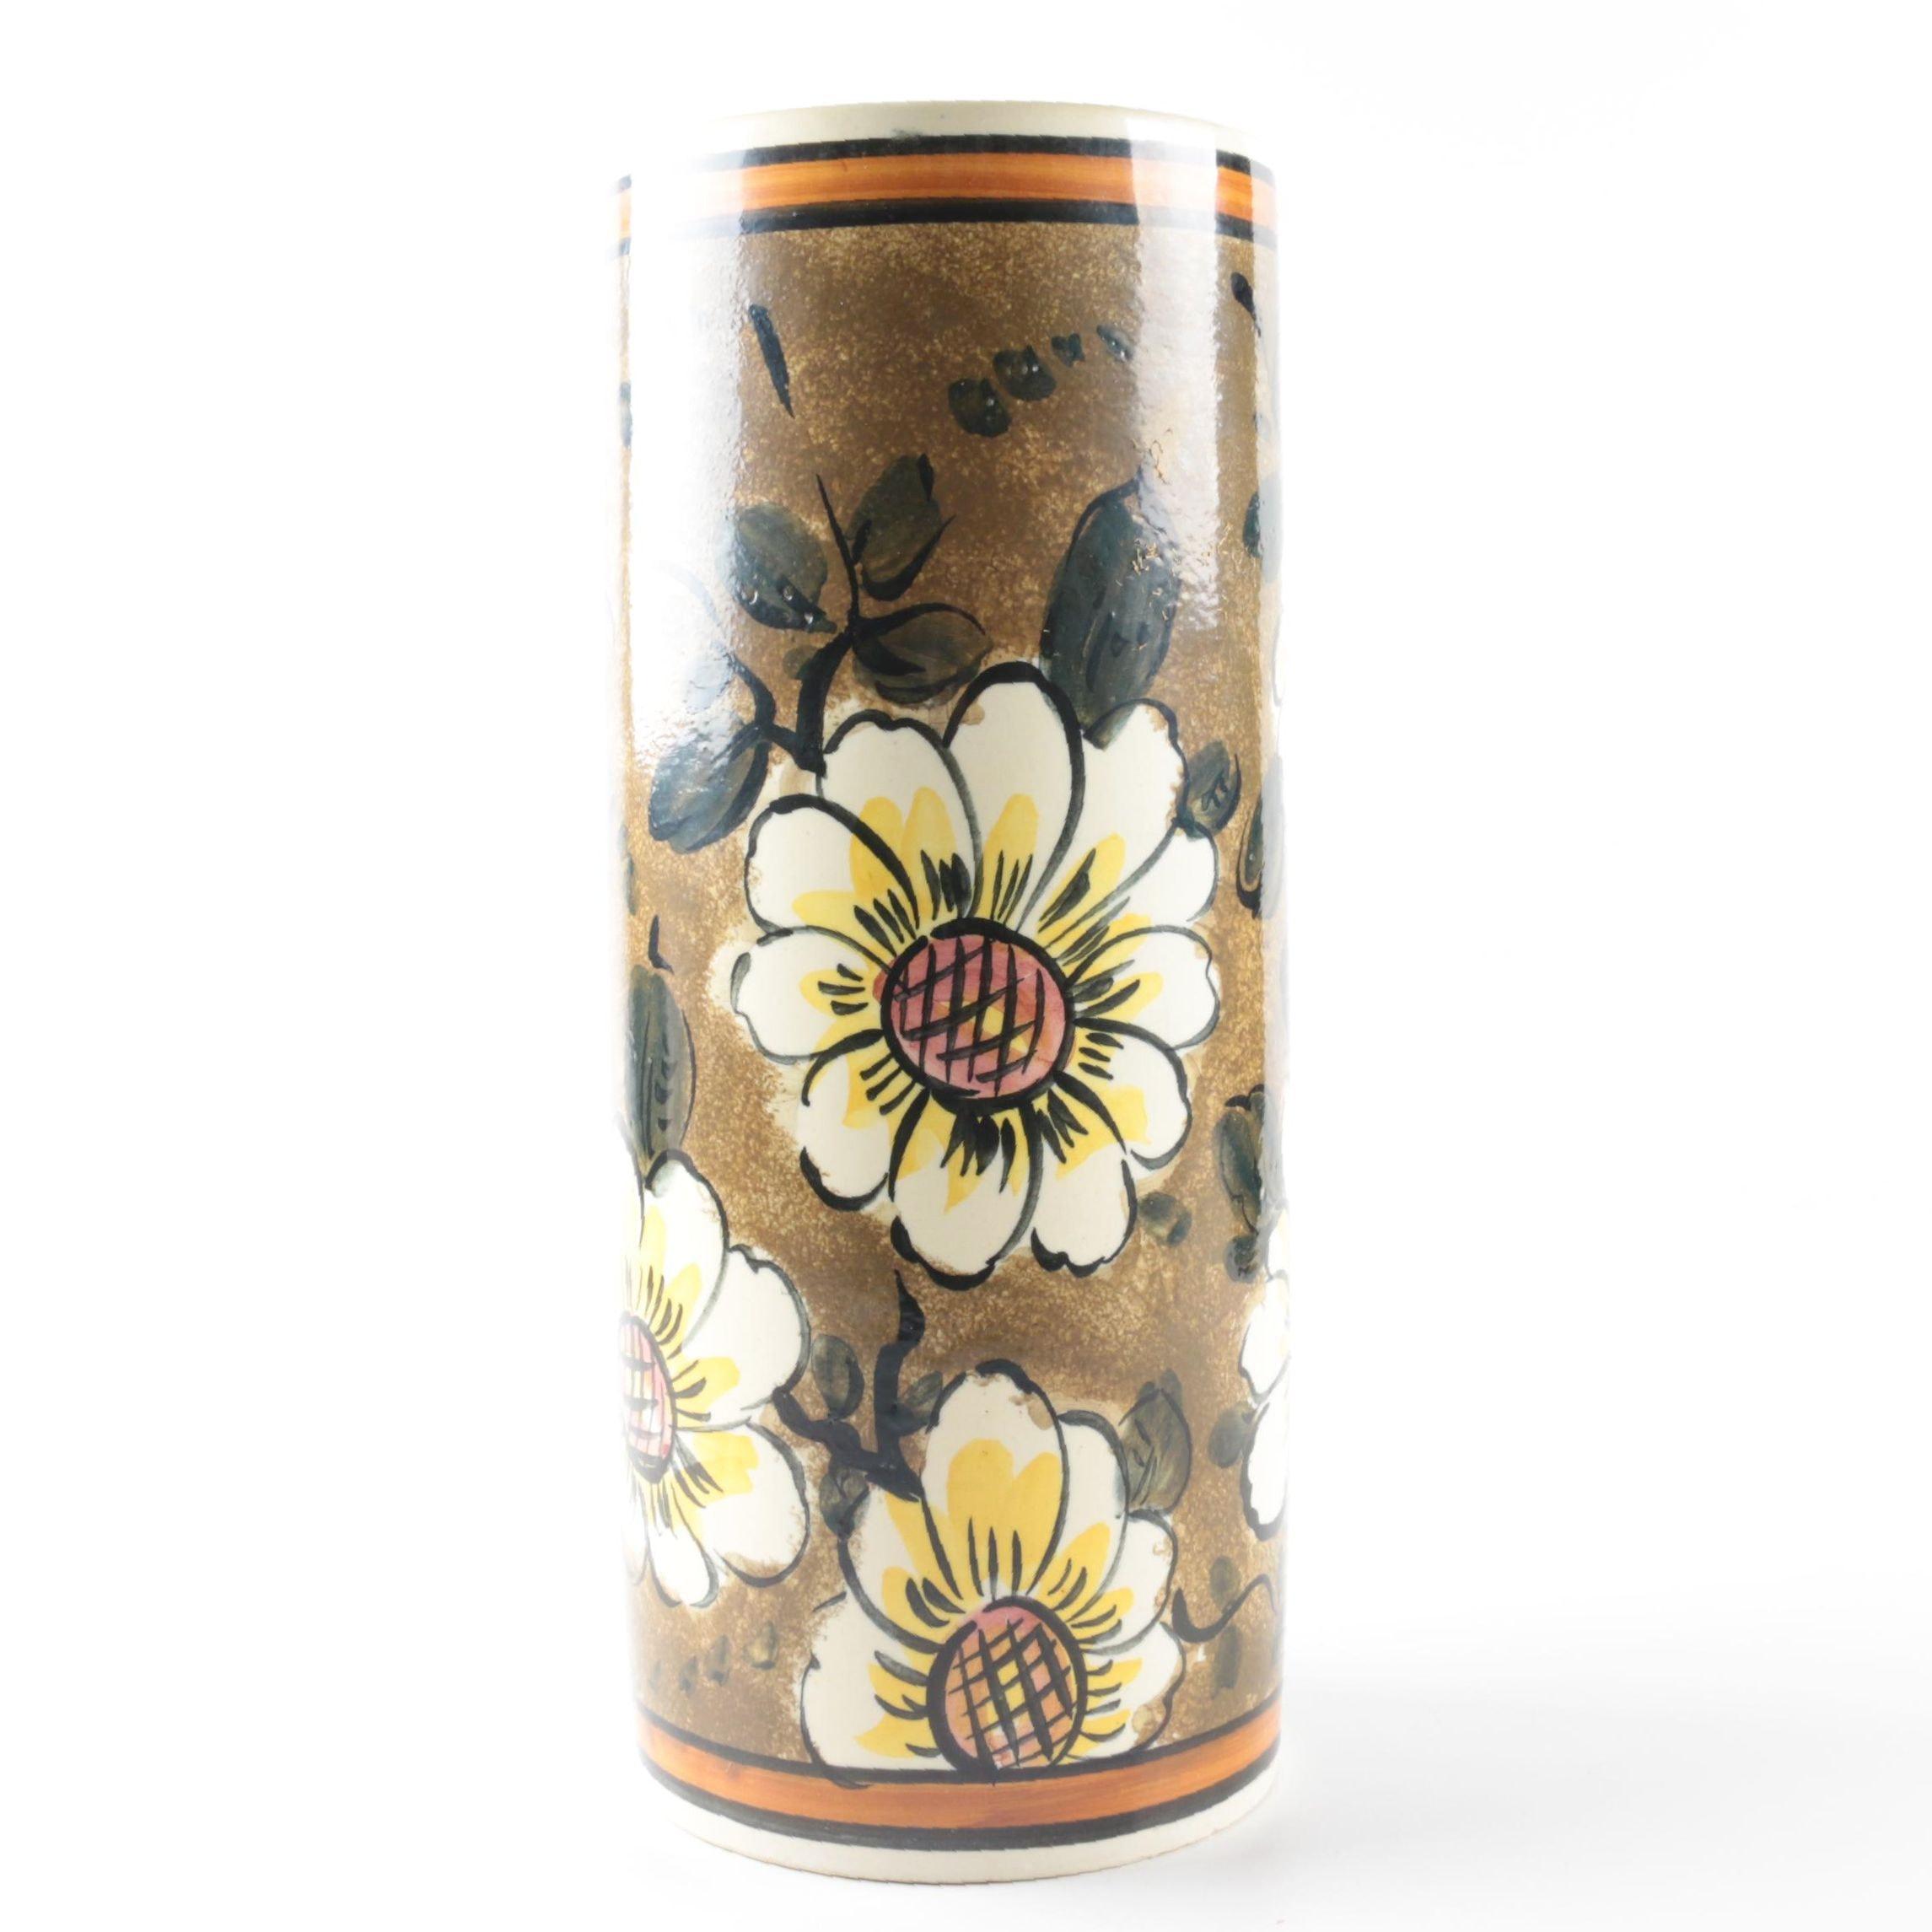 Hand-Painted Spanish Ceramic Vase